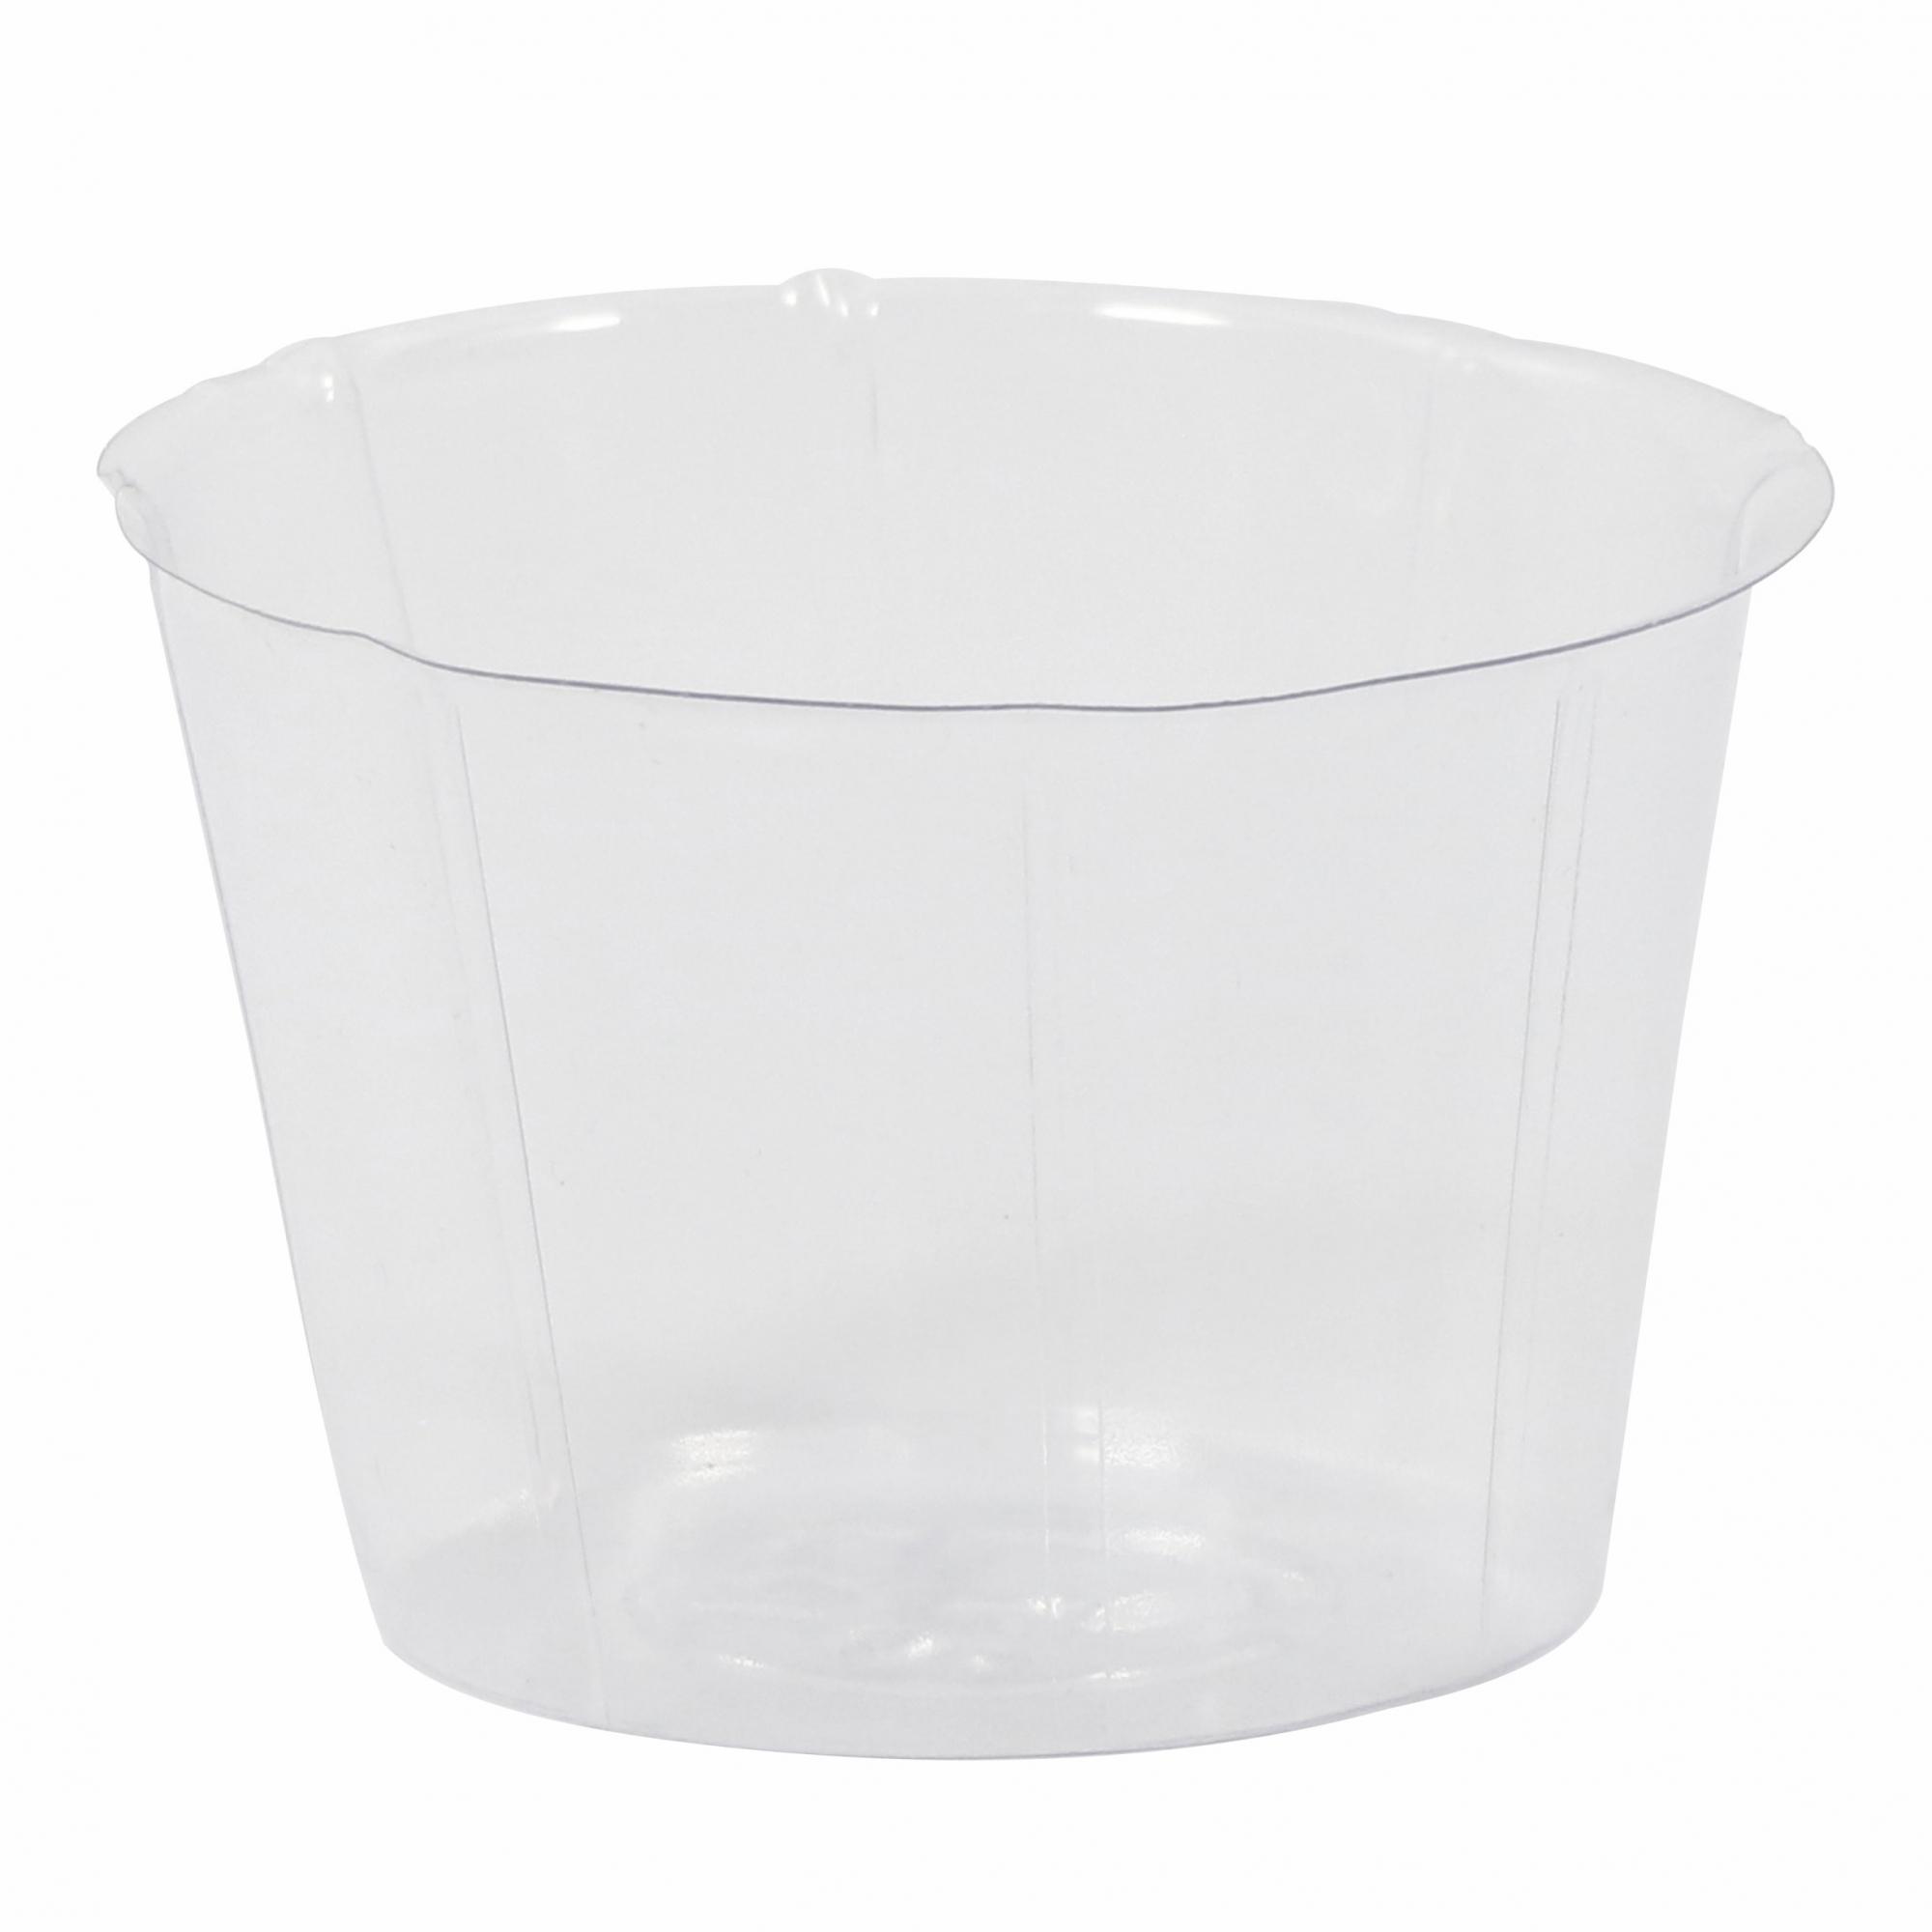 Cachepot de Plástico Transparente Inlay 17x11cm